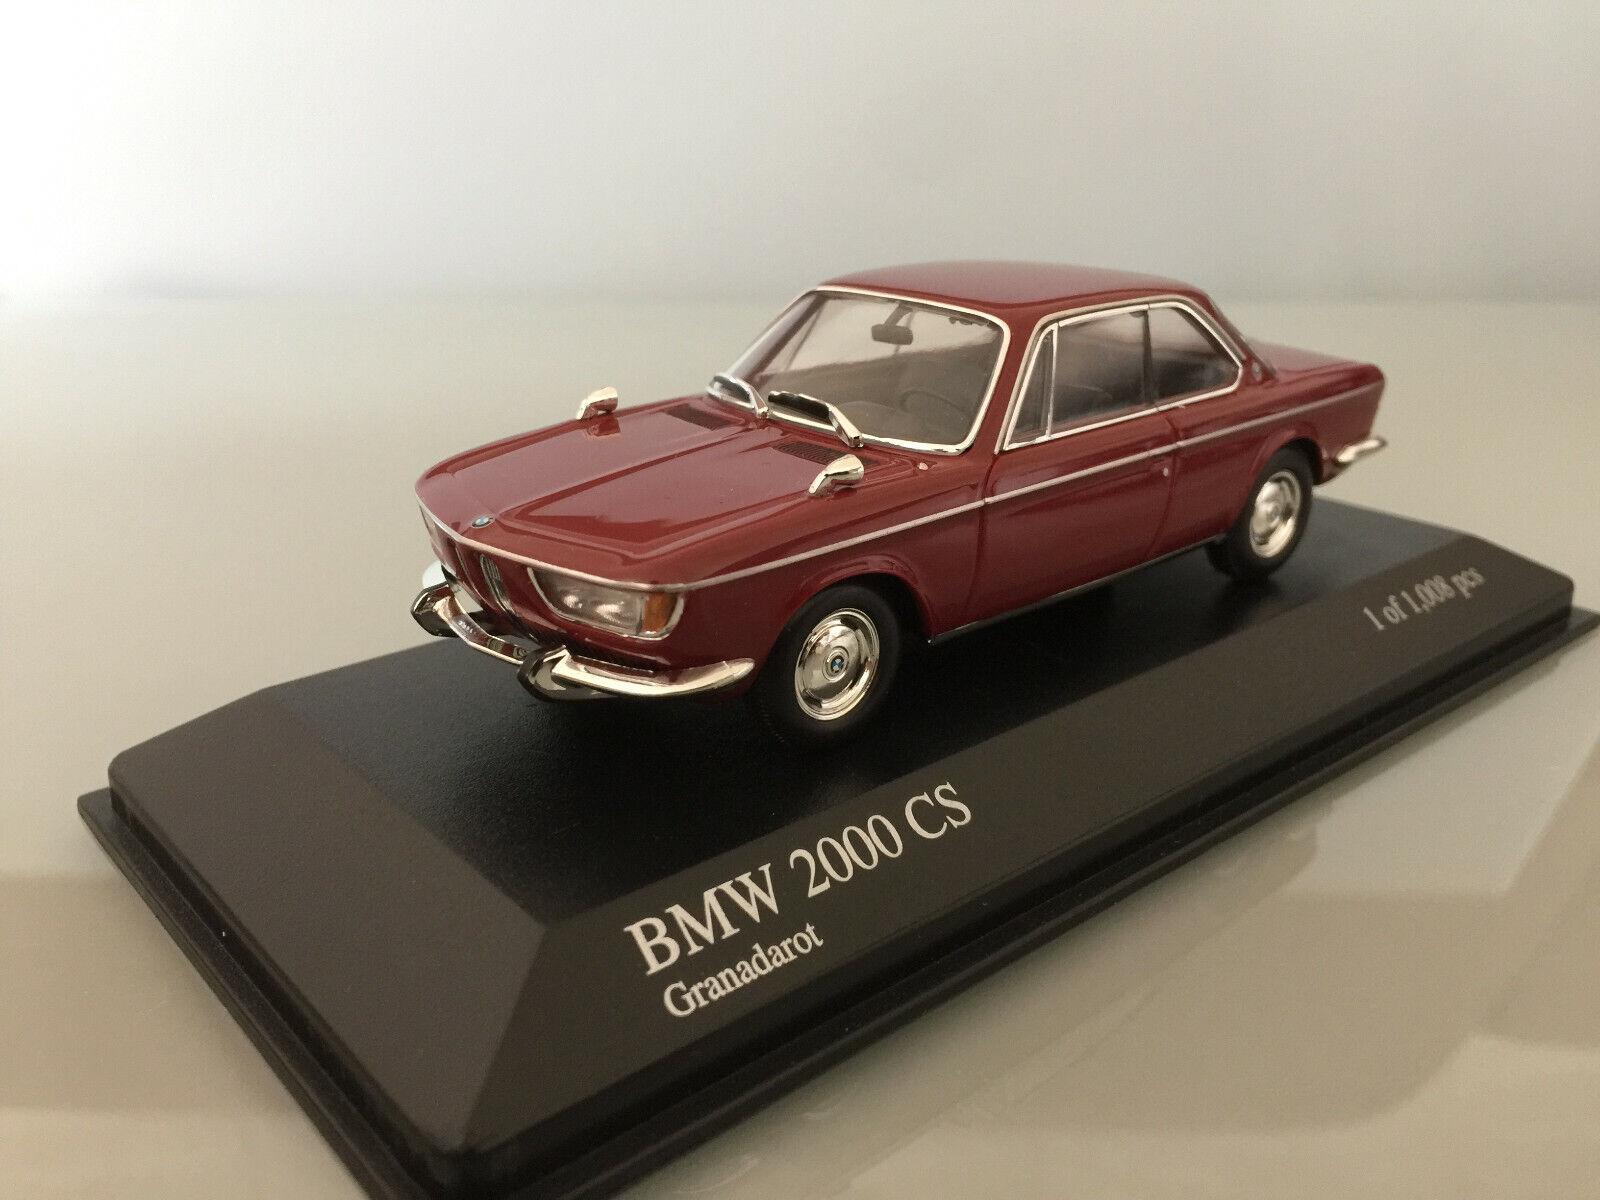 1 43 Minichamps BMW 2000 CS, 1967, granadarosso